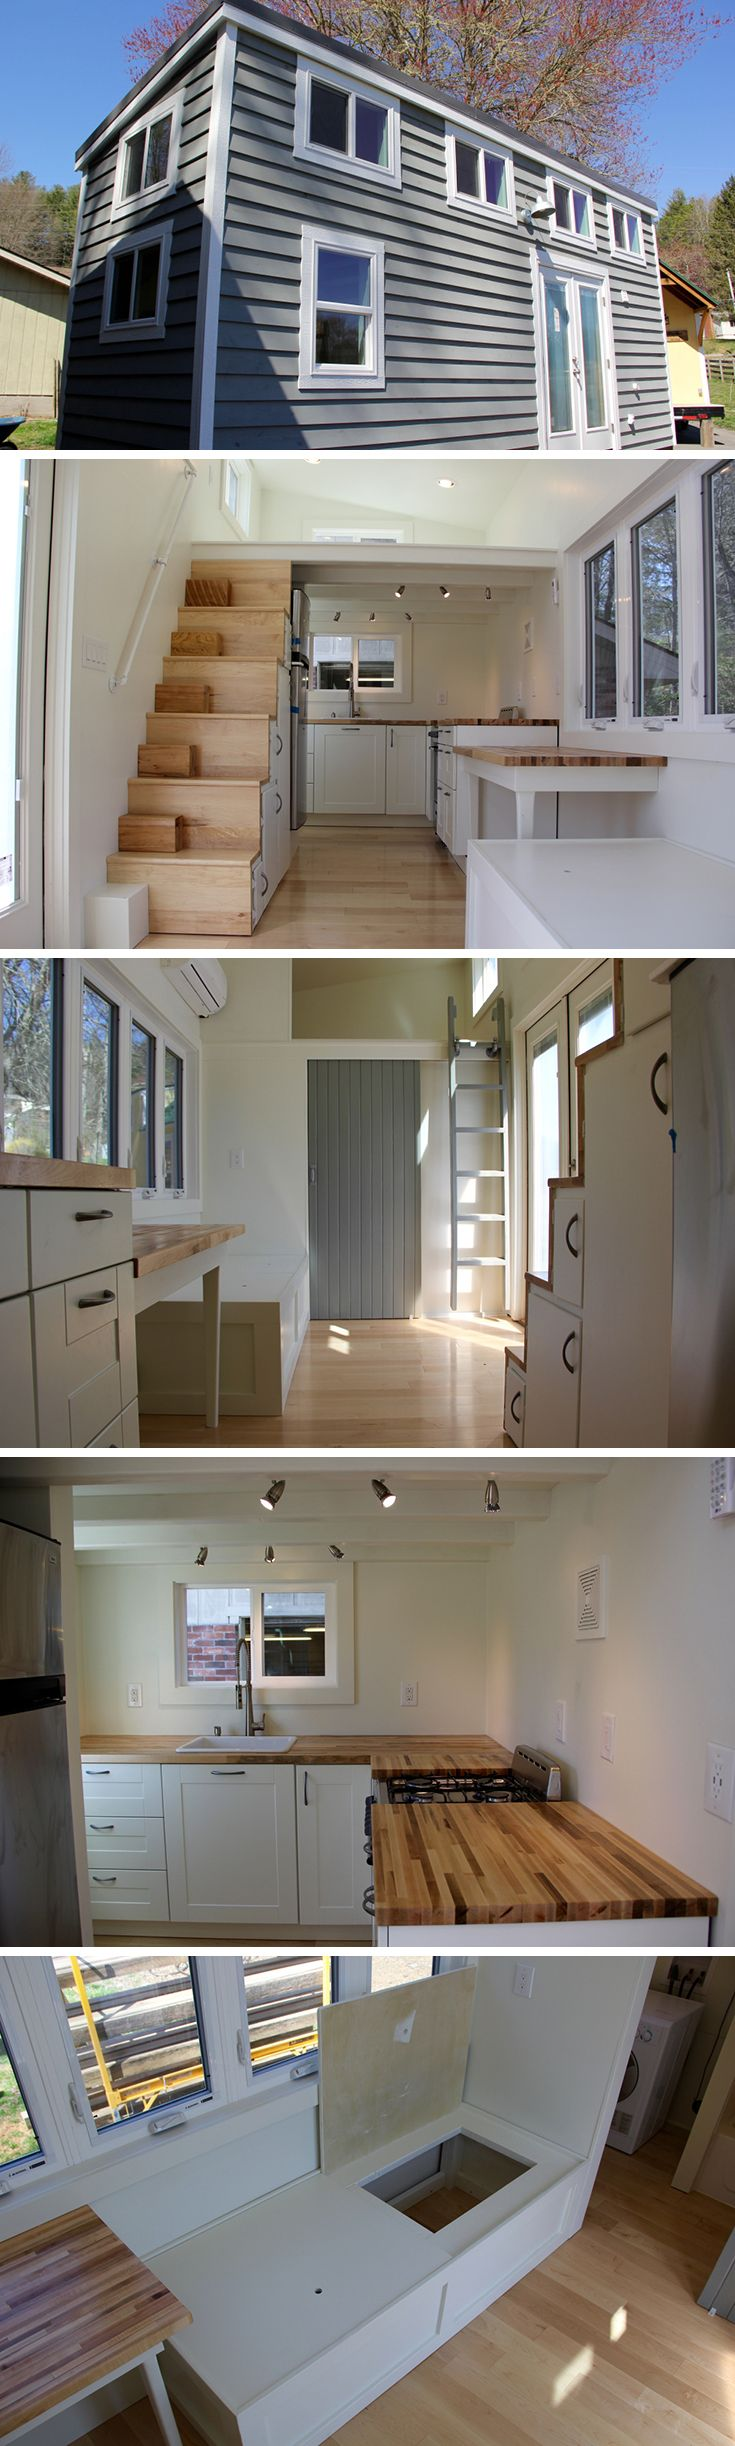 The Chickadee By Brevard Tiny House